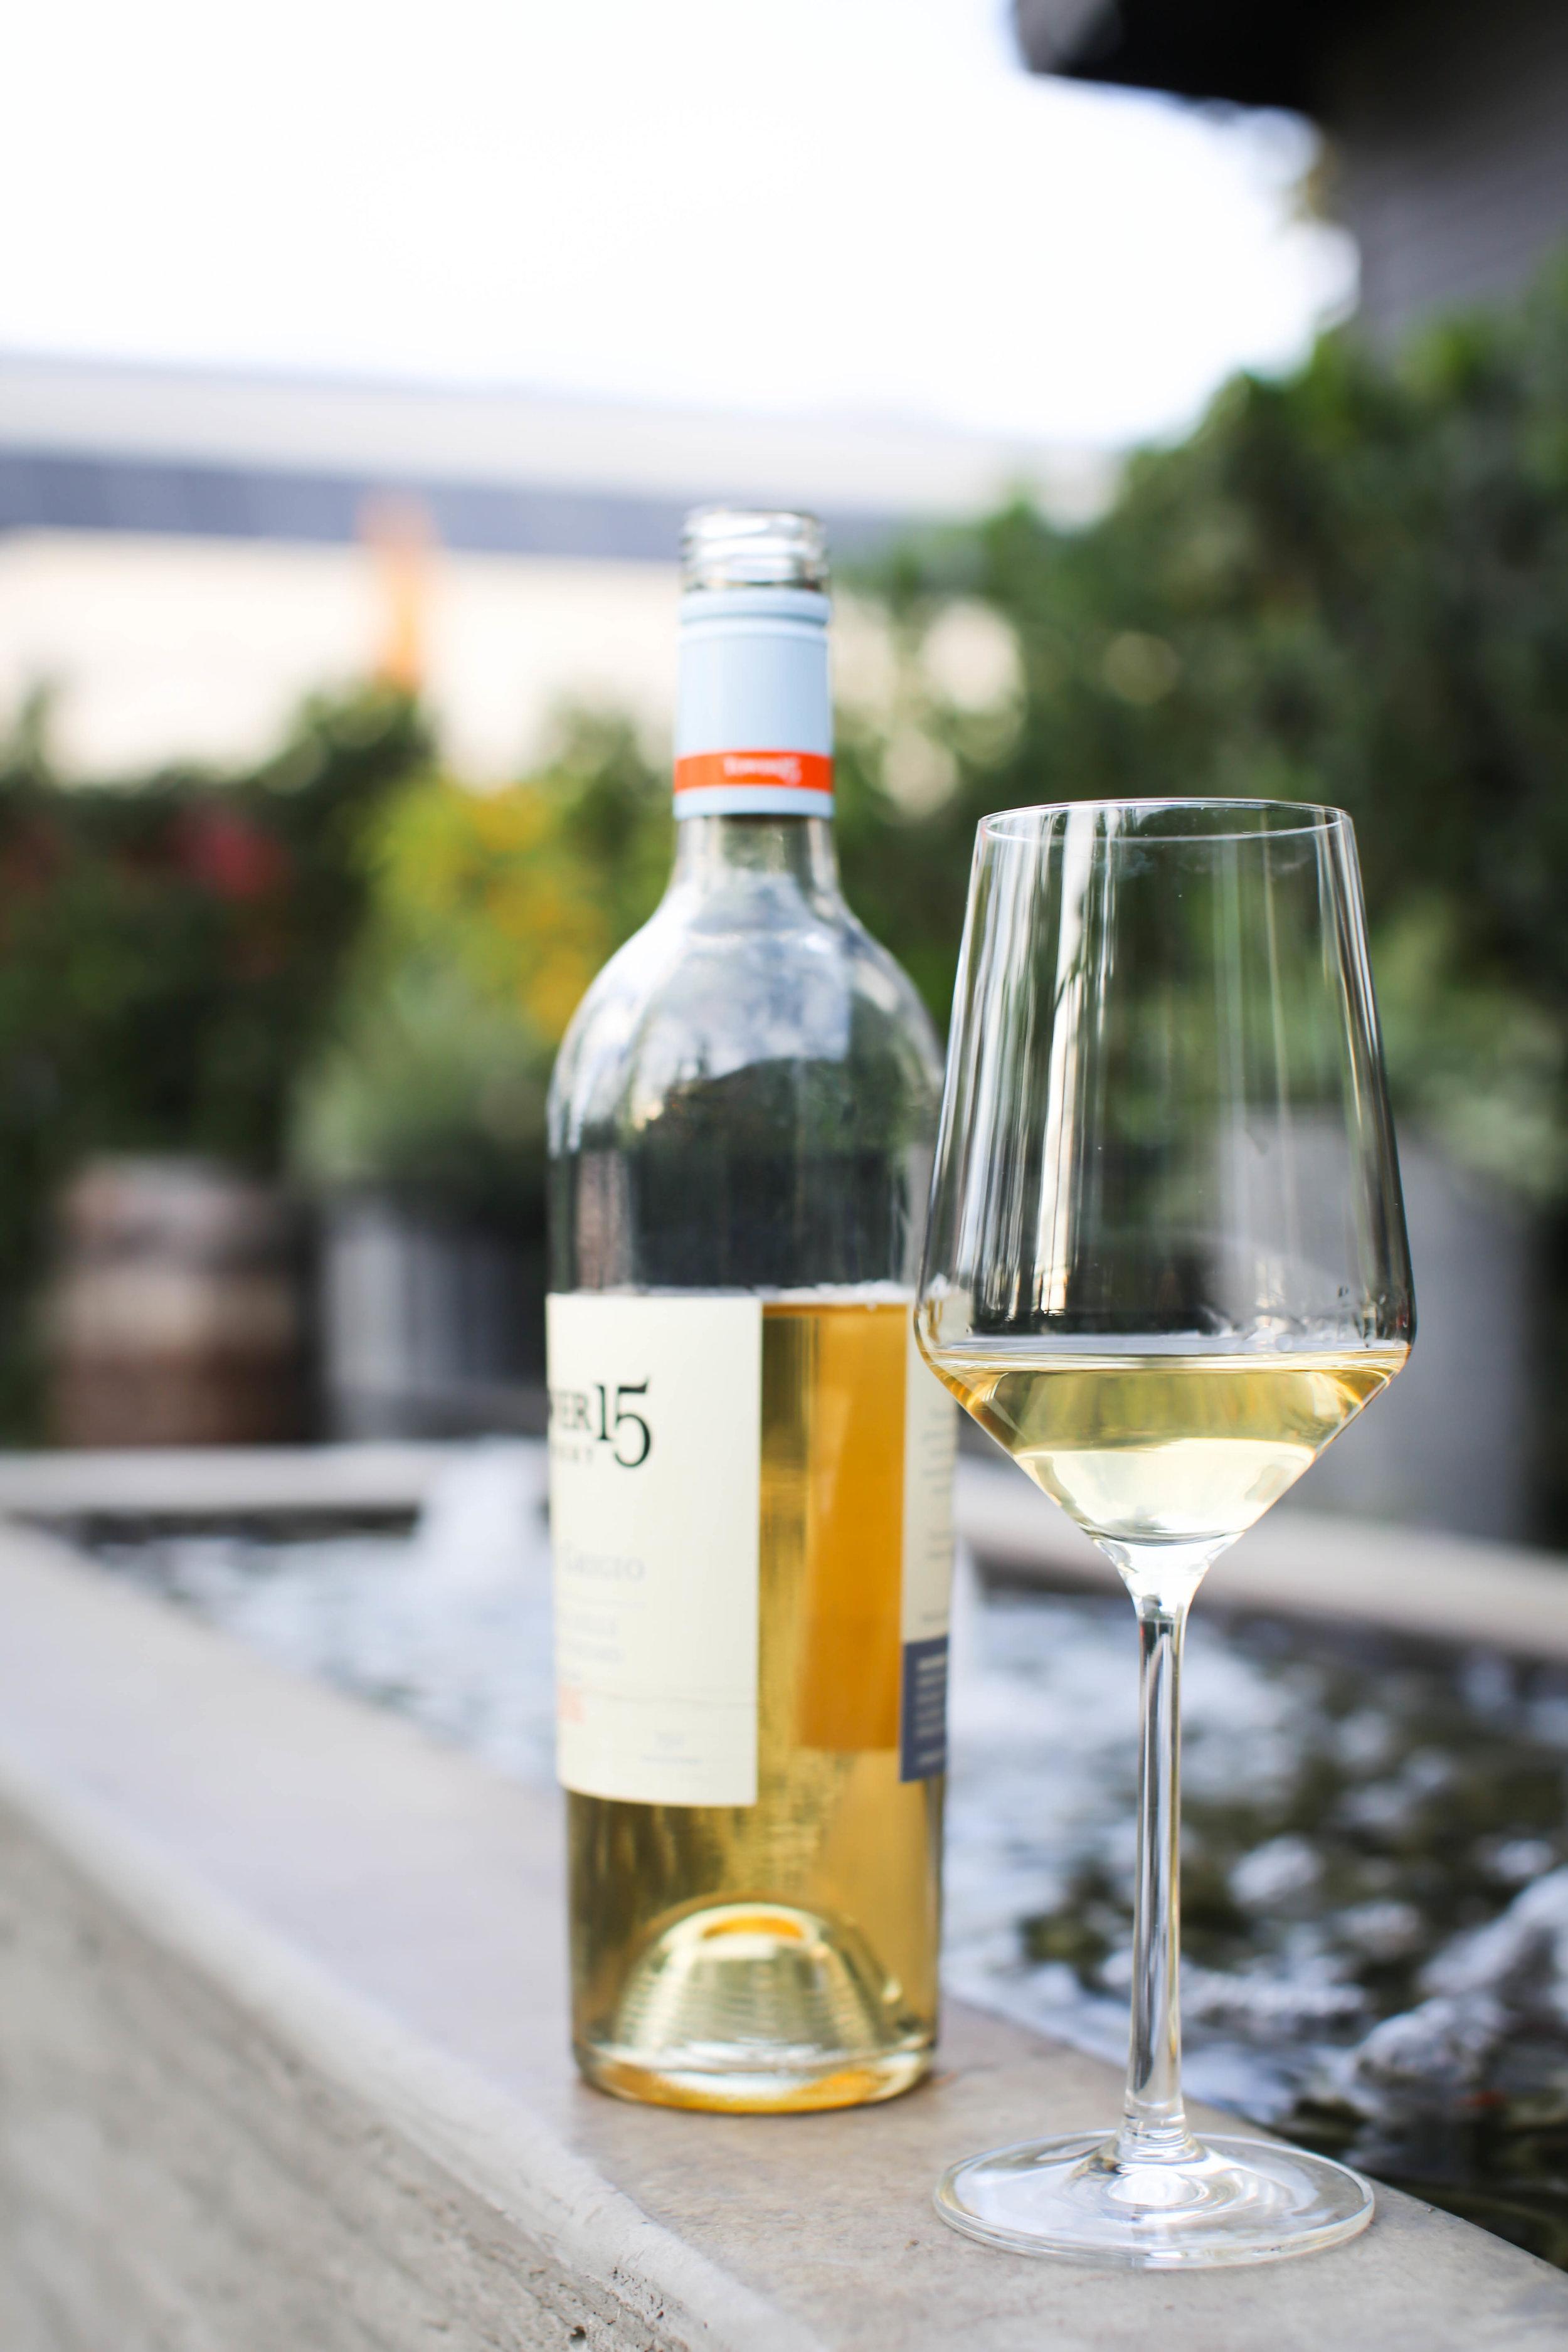 chardonnay-and-bottle2.jpg